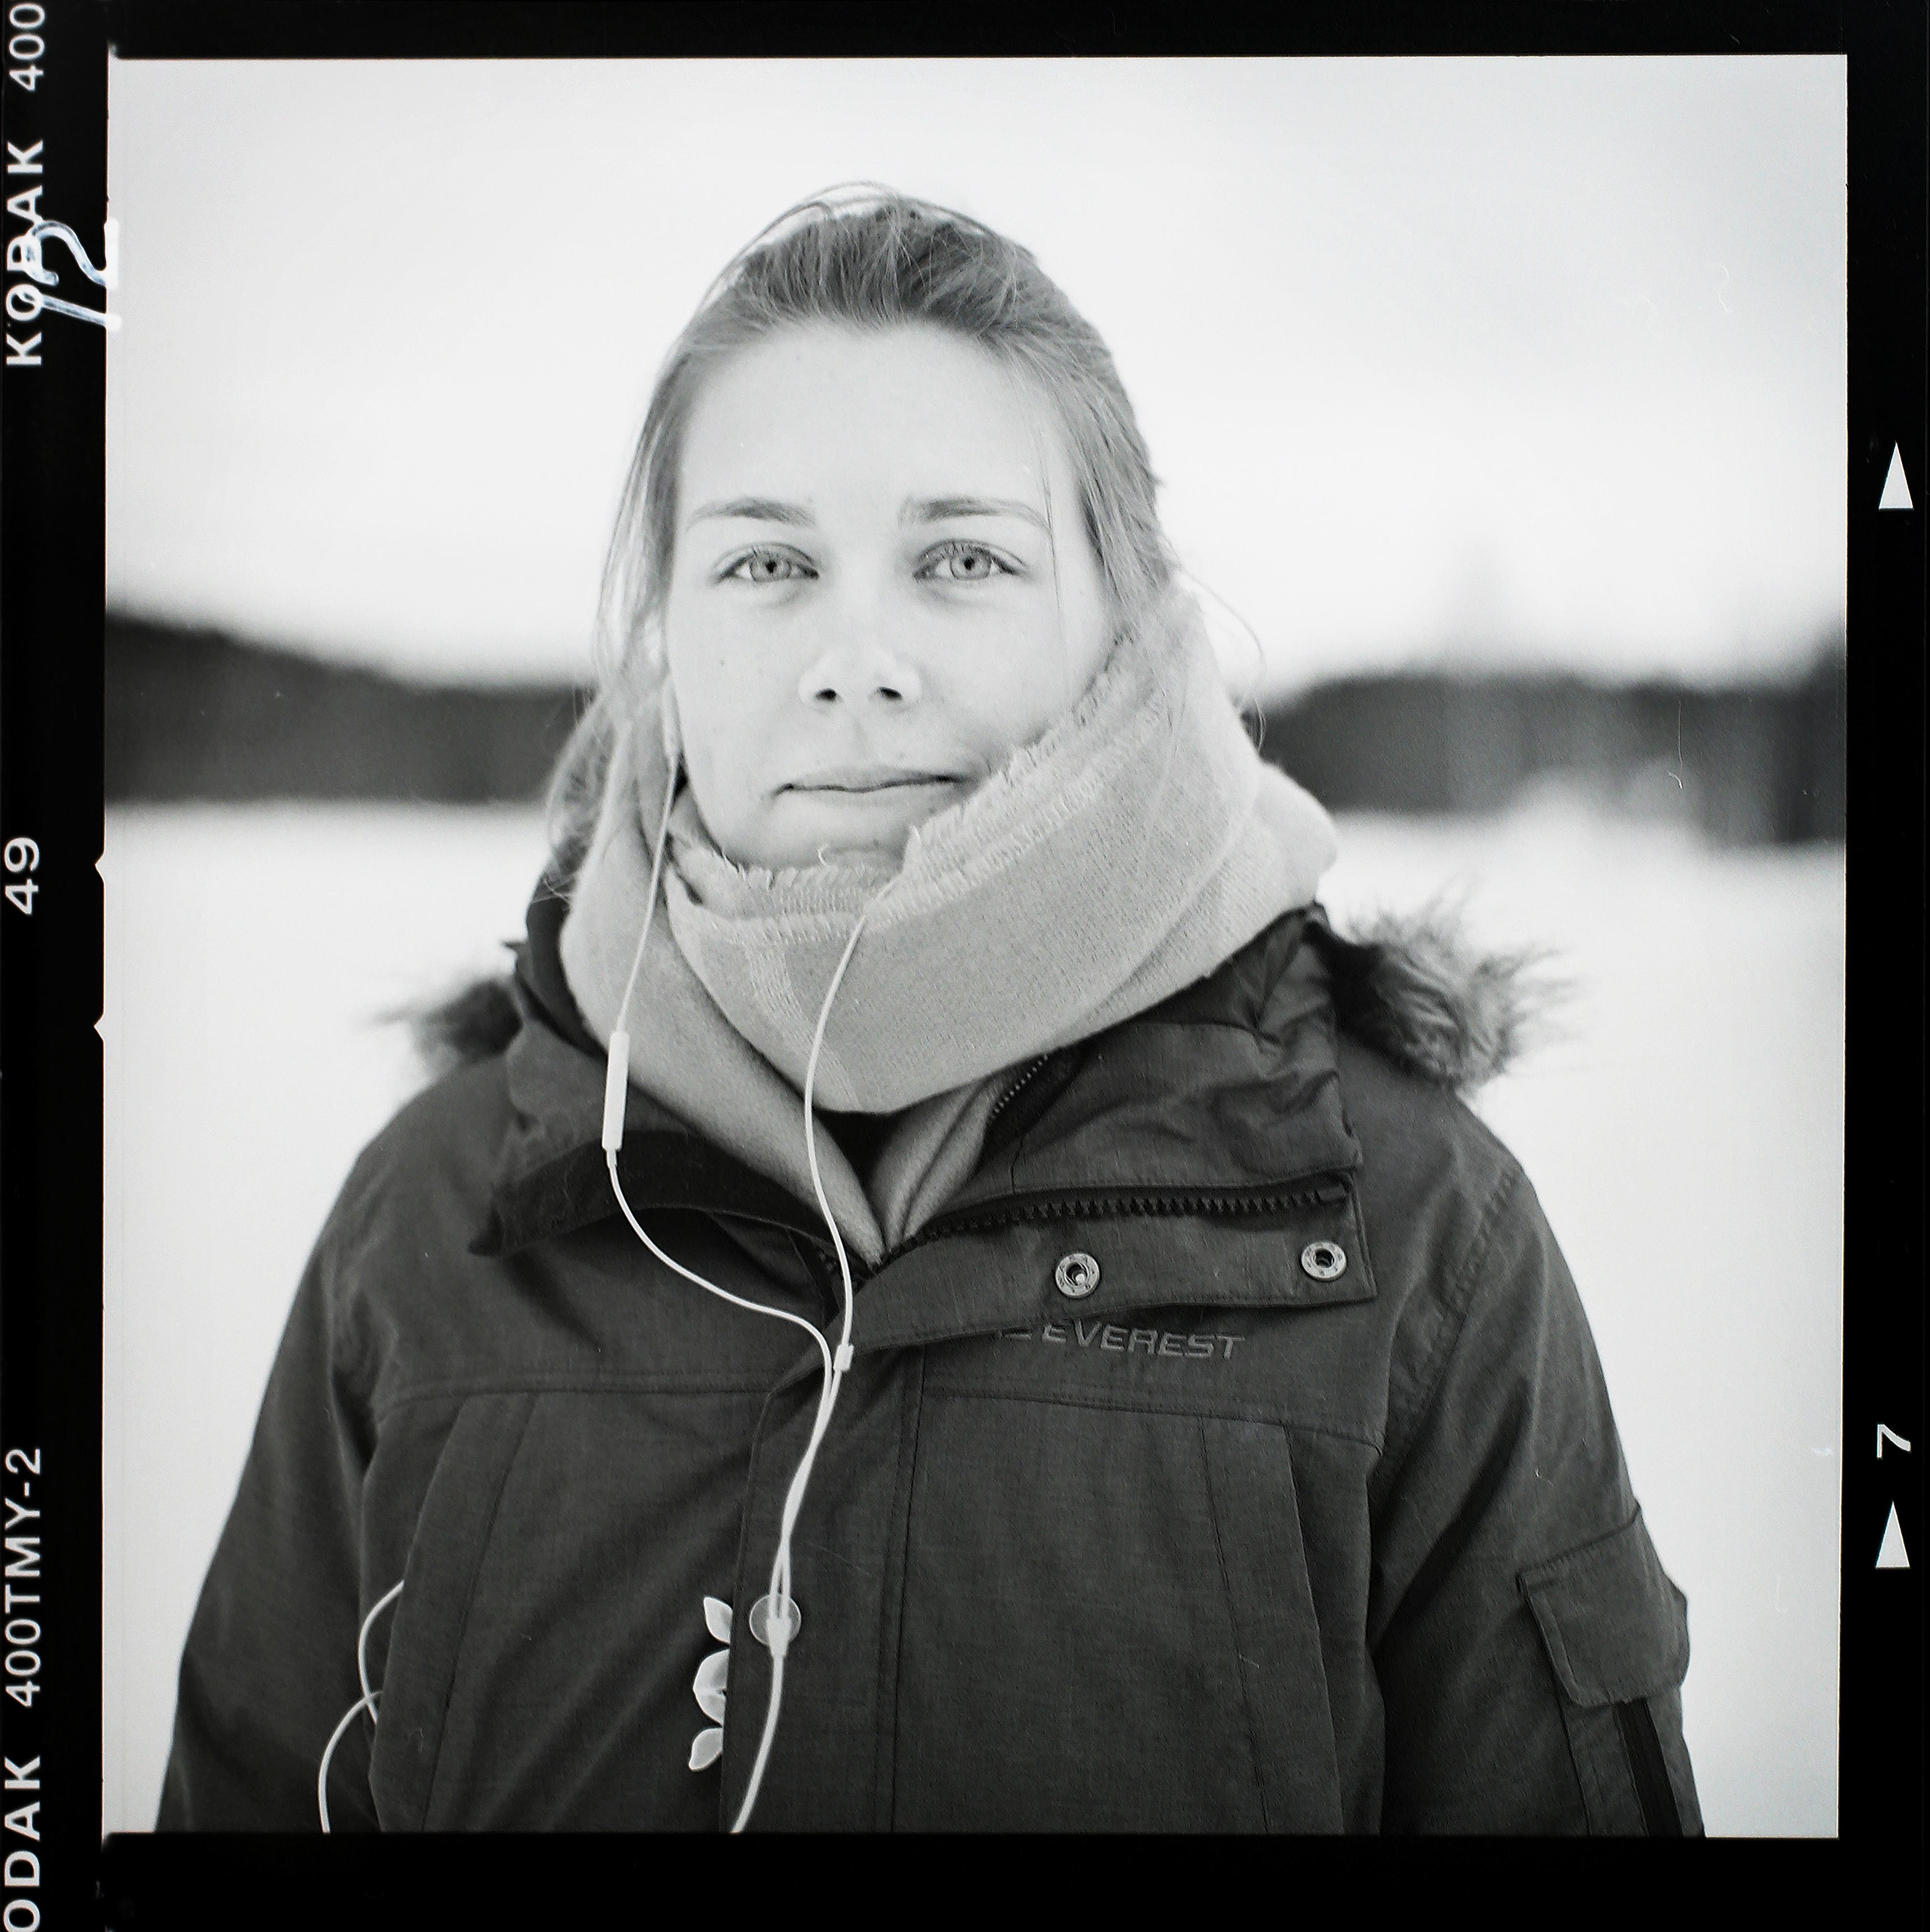 Linnea i Sundsvall. Foto: Mikael Andersson, Hasselblad 500 cm, 80mm/2,8. Exponerad f2,8-1/60sek